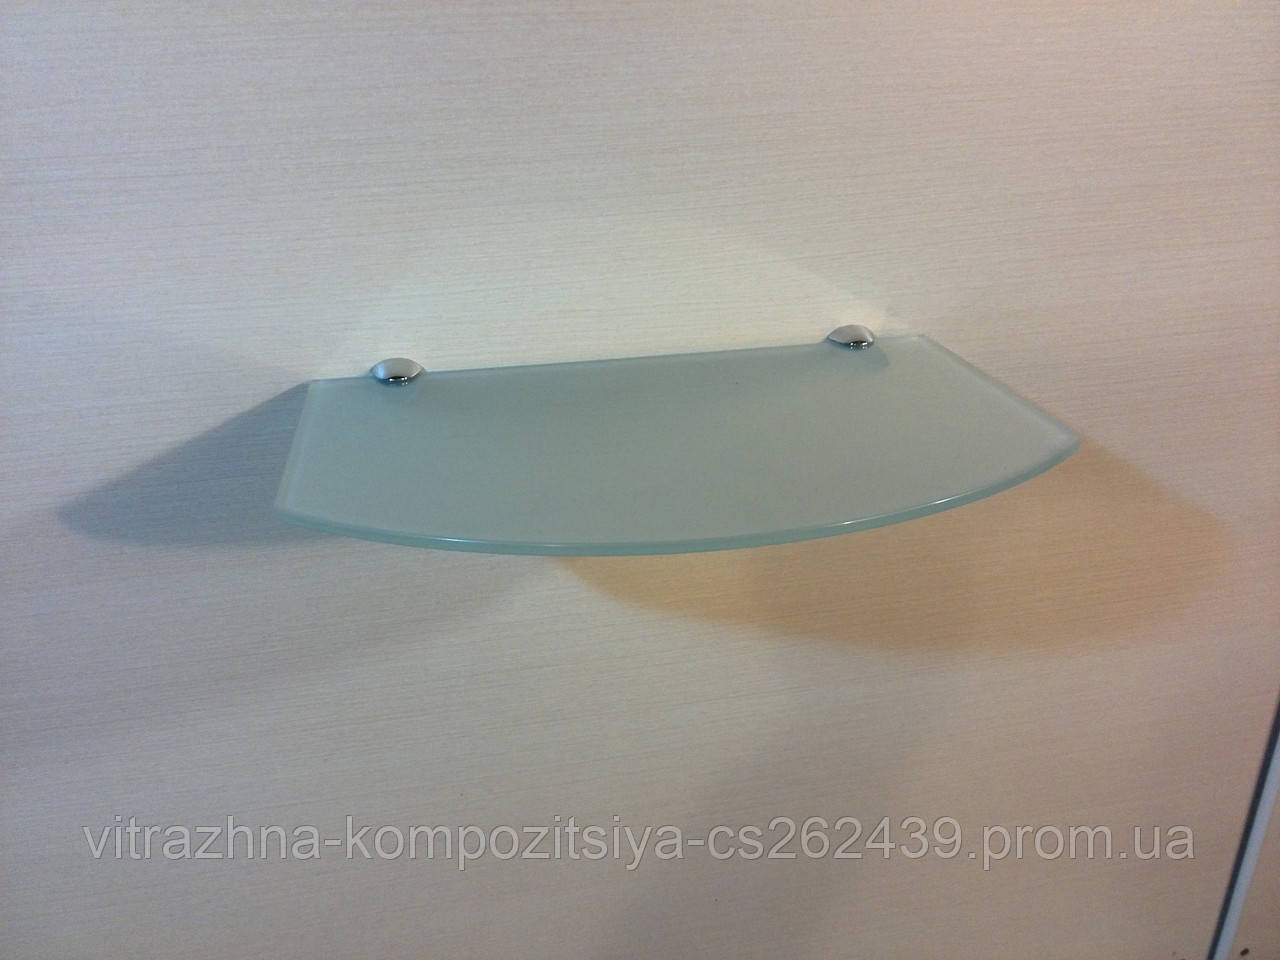 Полка стеклянная под тюнер матовая 5 мм 35 х 22 см